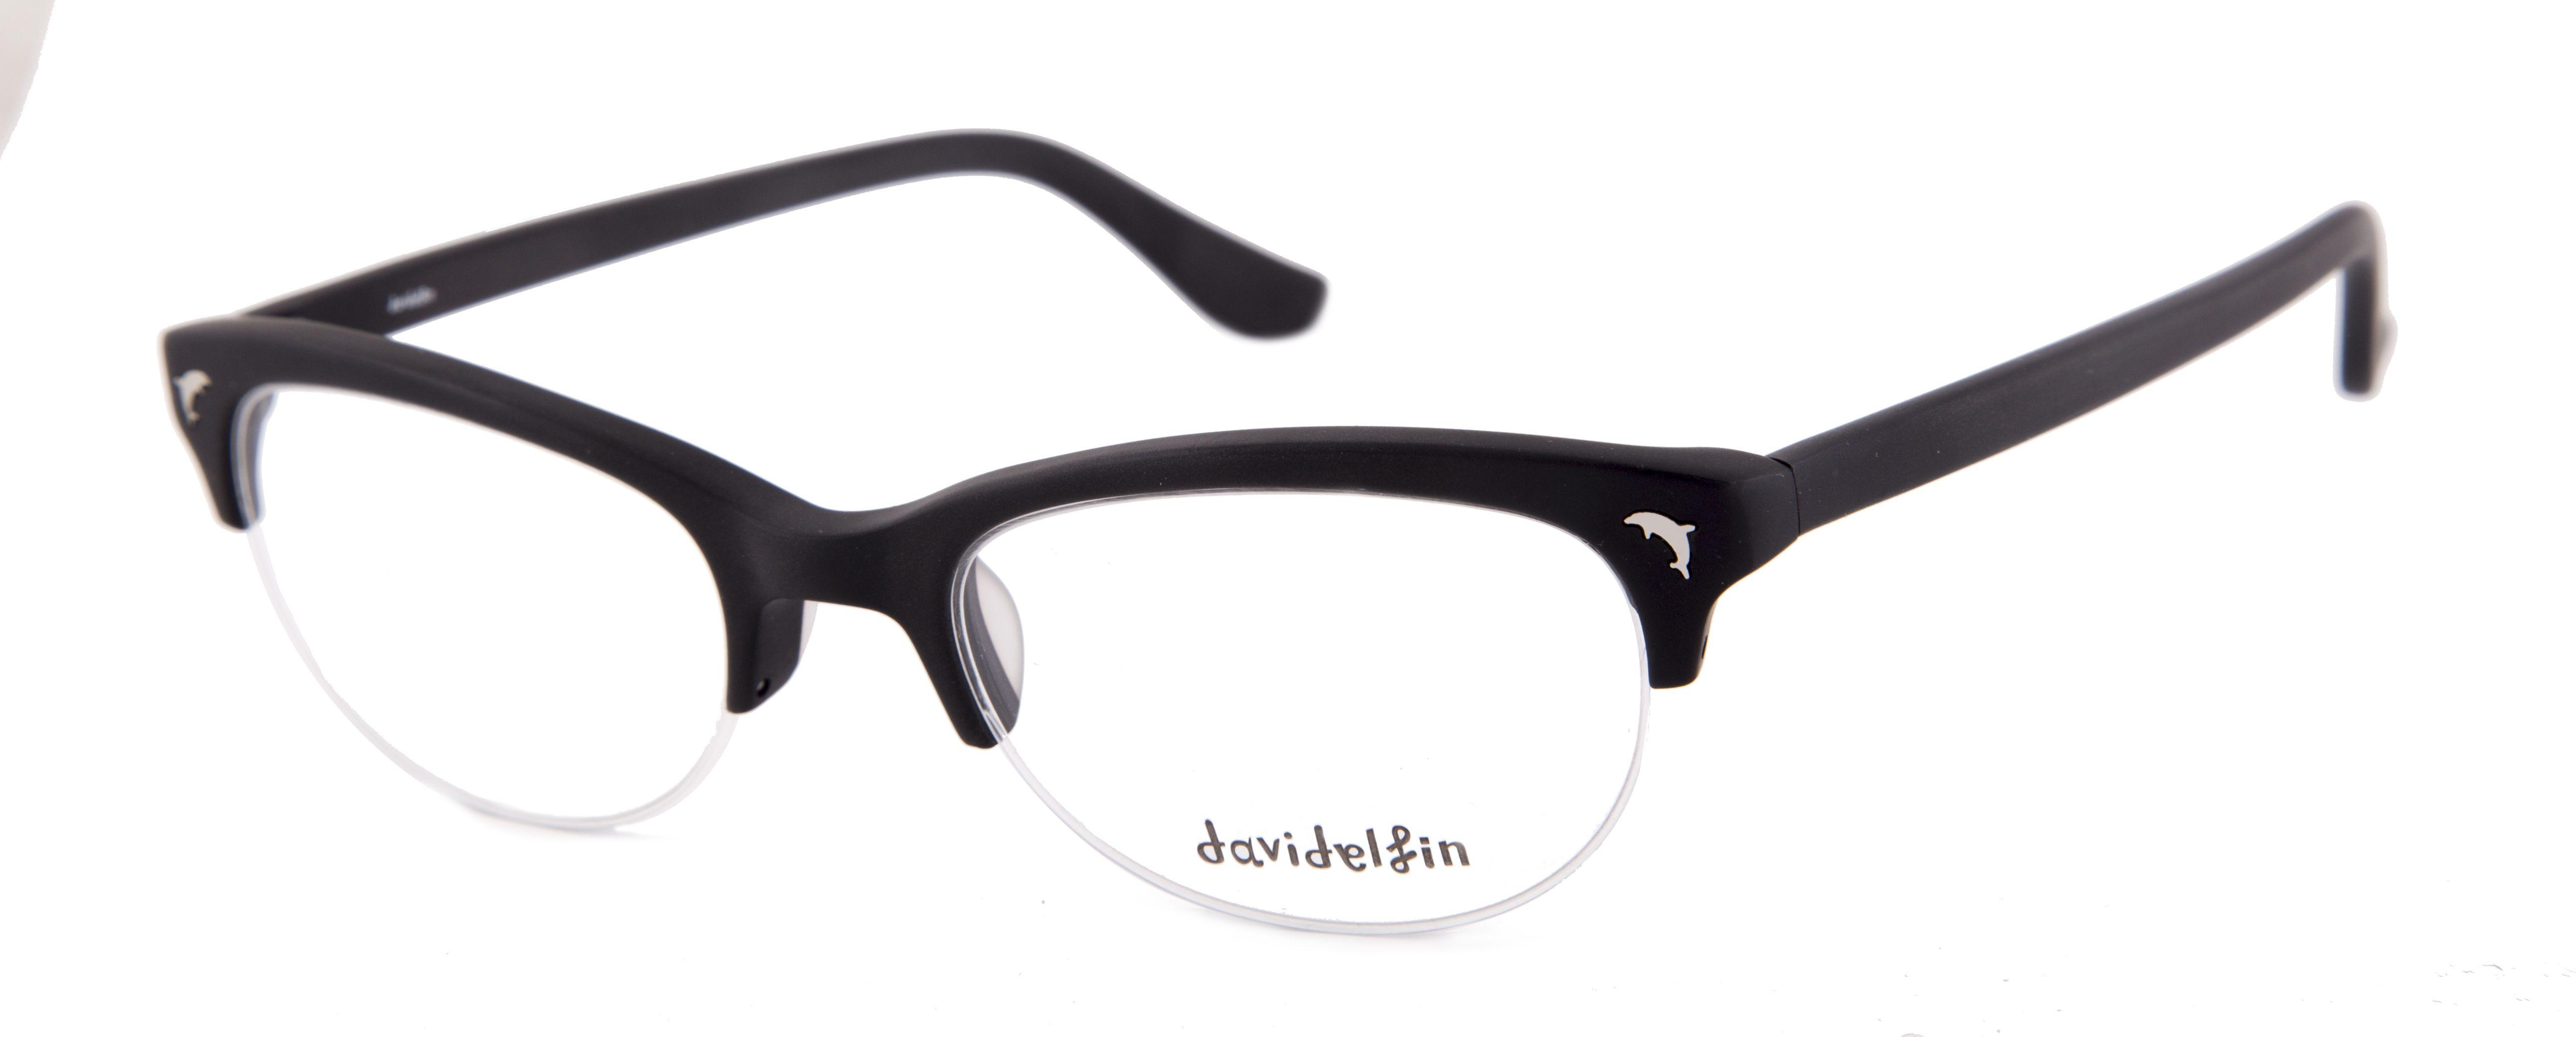 Gafas OpticaliaMontura Retro Por Davidelfin Para De Estilo Diseñas 8wOPkNnX0